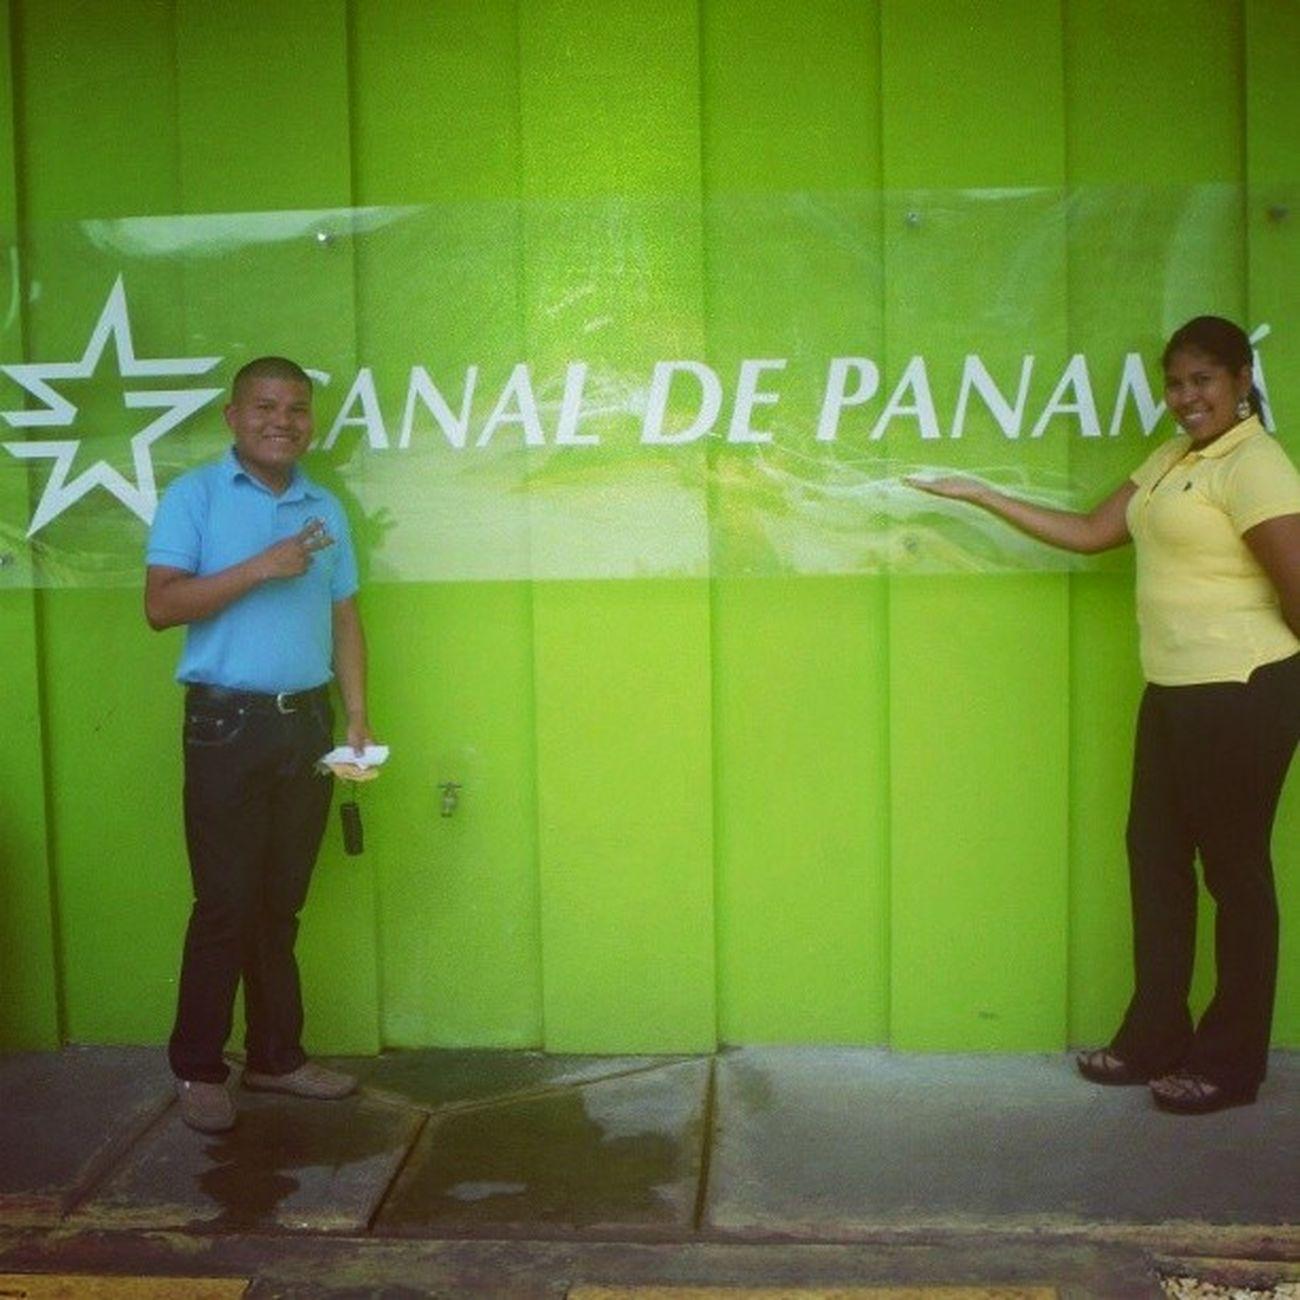 Me ft @da17niela at @canaldepanama CentroDeObservacionDeLaAmpliacion Gatun Colon C3 InstaLikes InstaMoments Amazing Panama GiraAcademica University EconomySchool